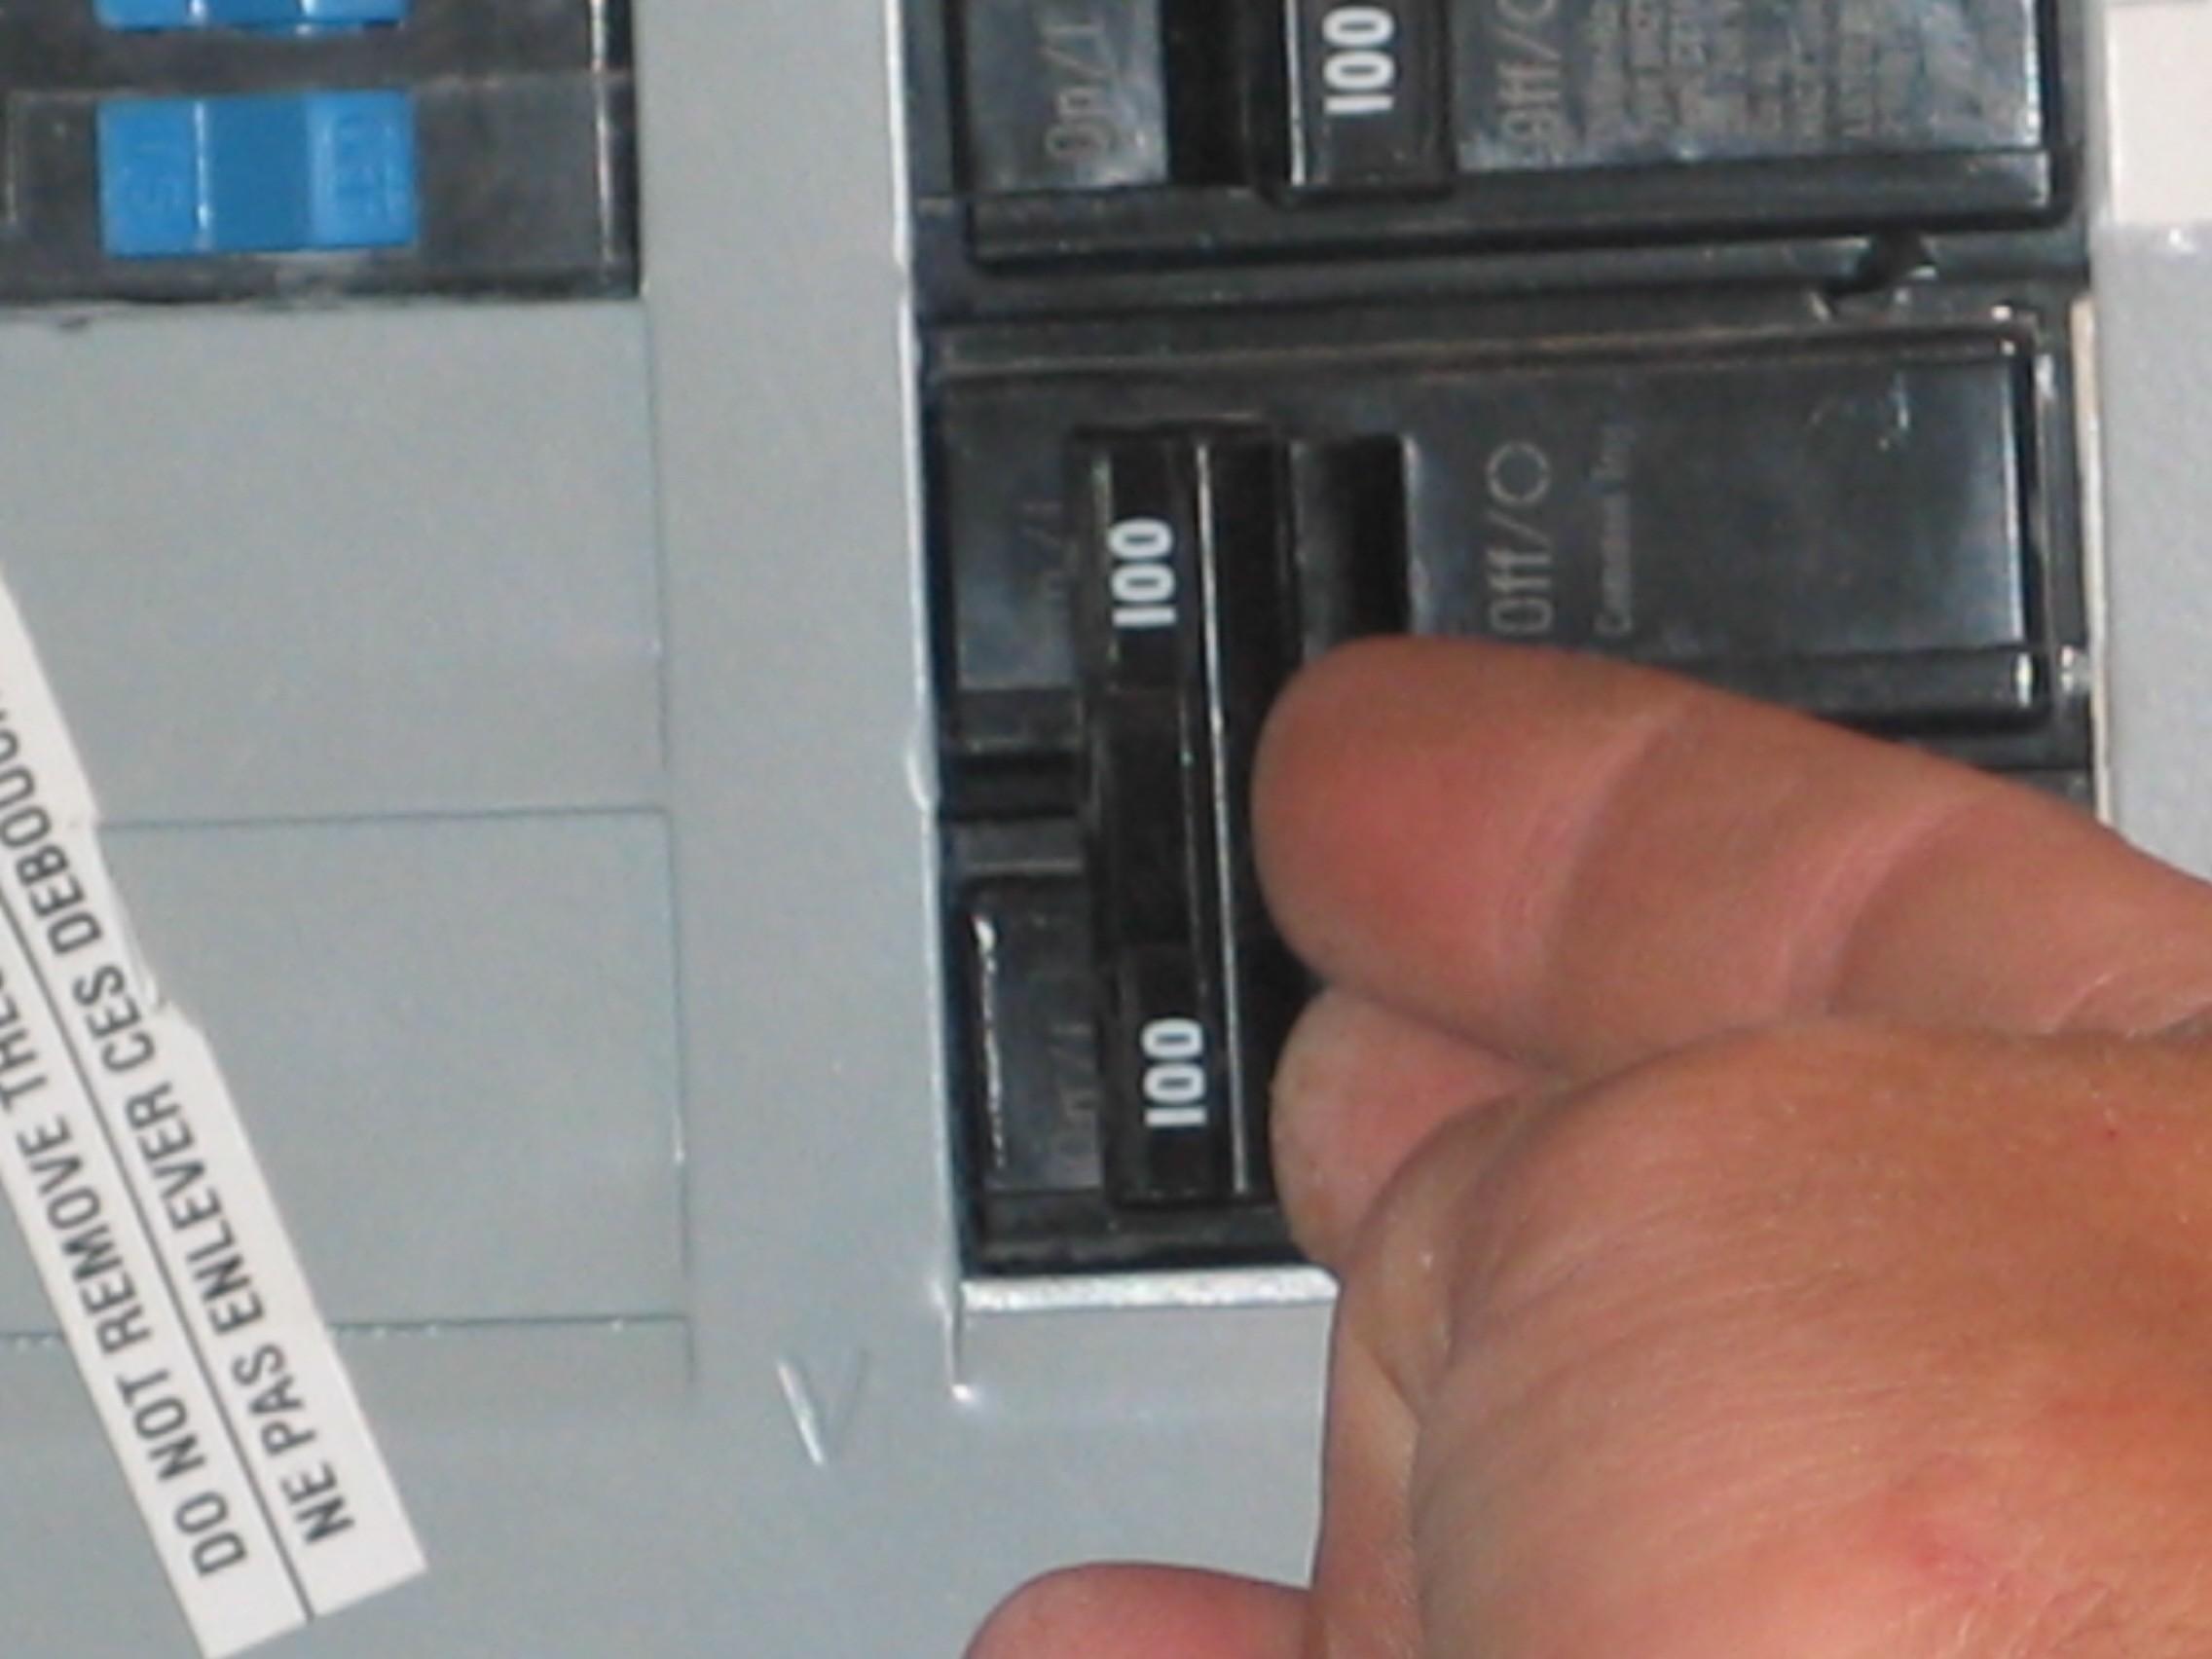 30 Amp Sub Panel Wiring Diagram 827dc 30 Amp Panel Box Wiring Diagram Of 30 Amp Sub Panel Wiring Diagram